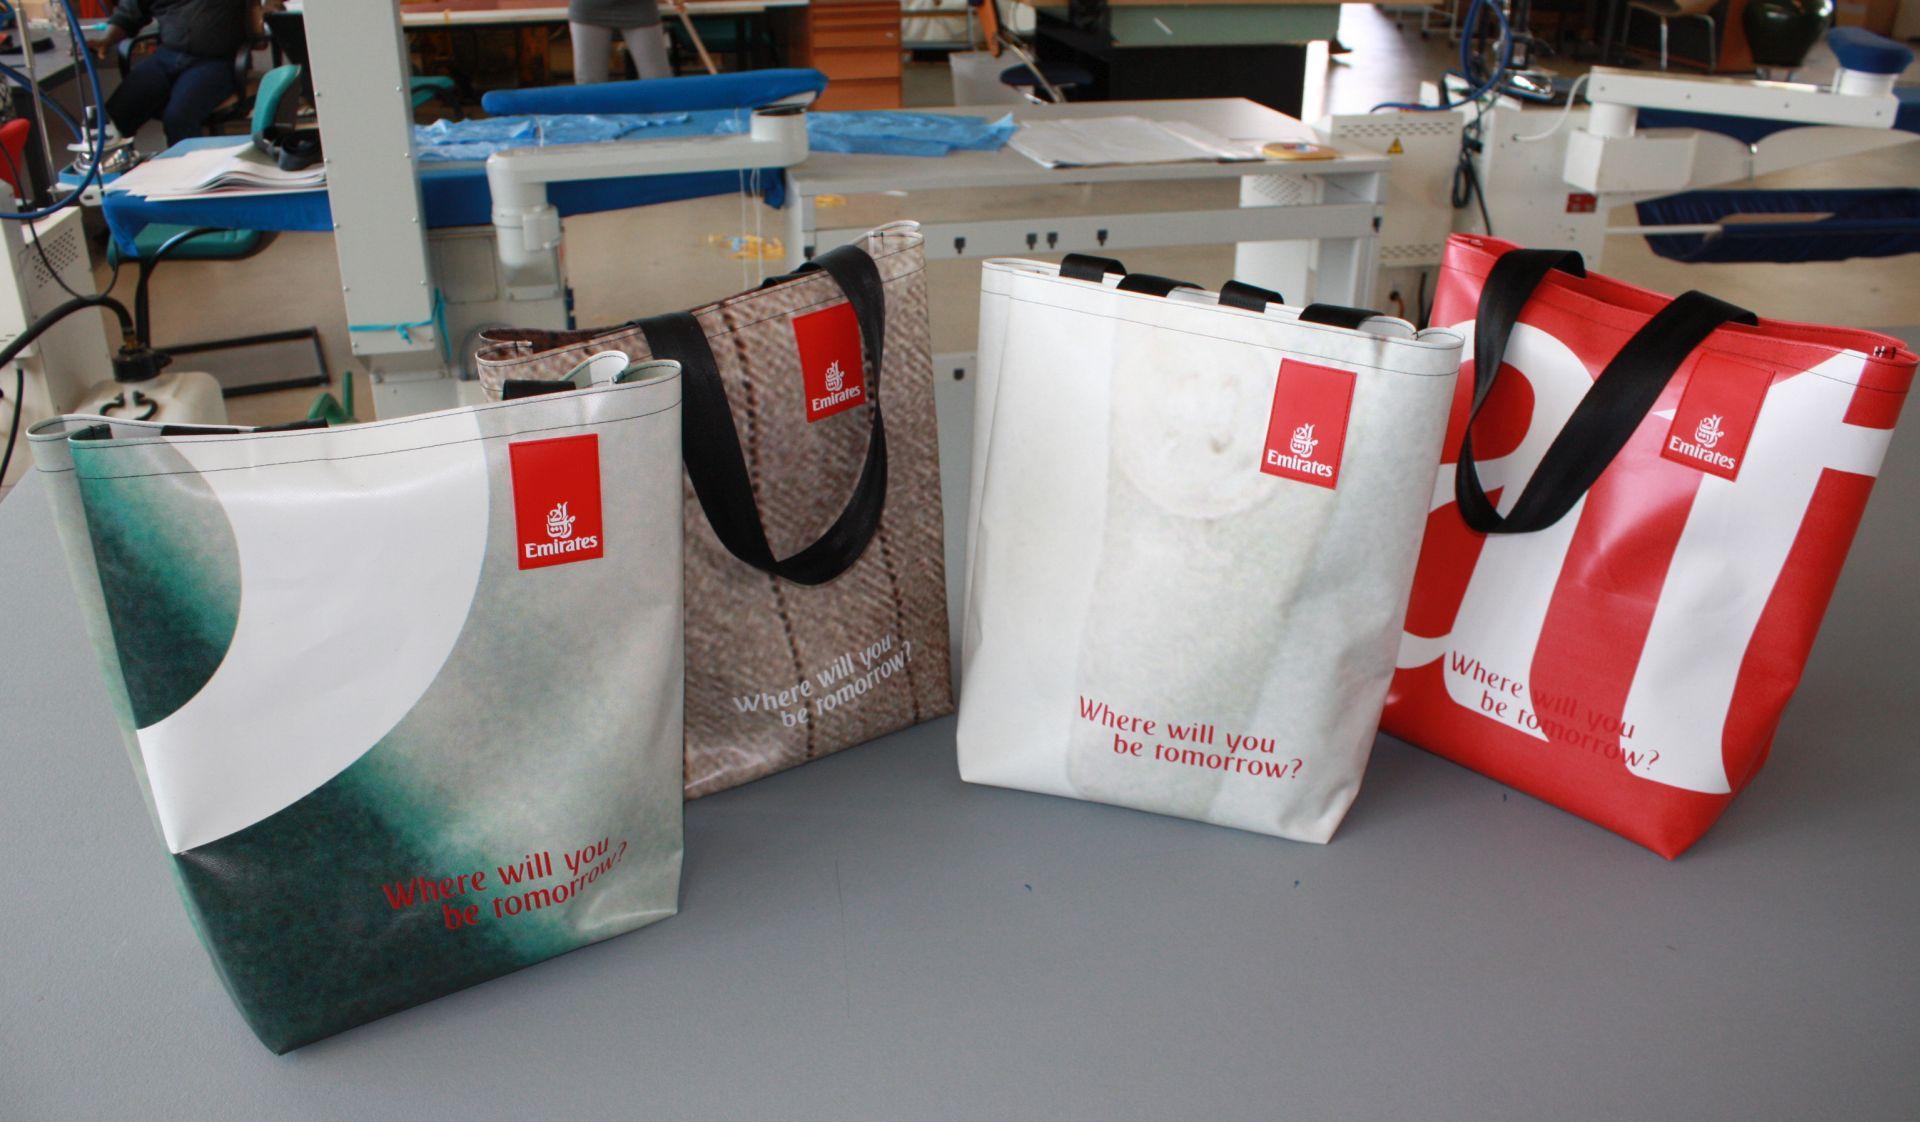 Emirates shopping bags